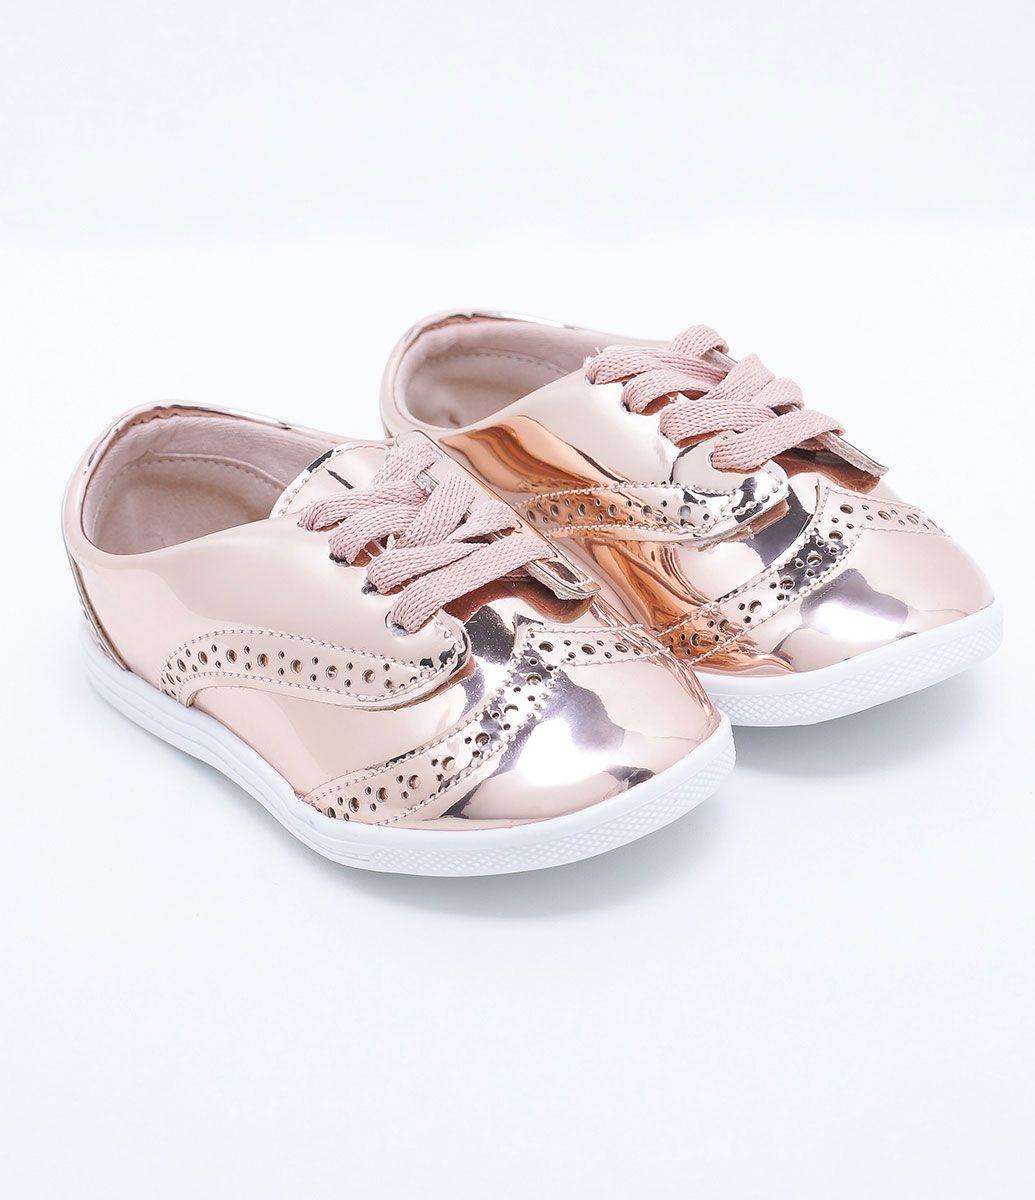 Chaussures Violettes Enfants Veja QP5cyf6G2